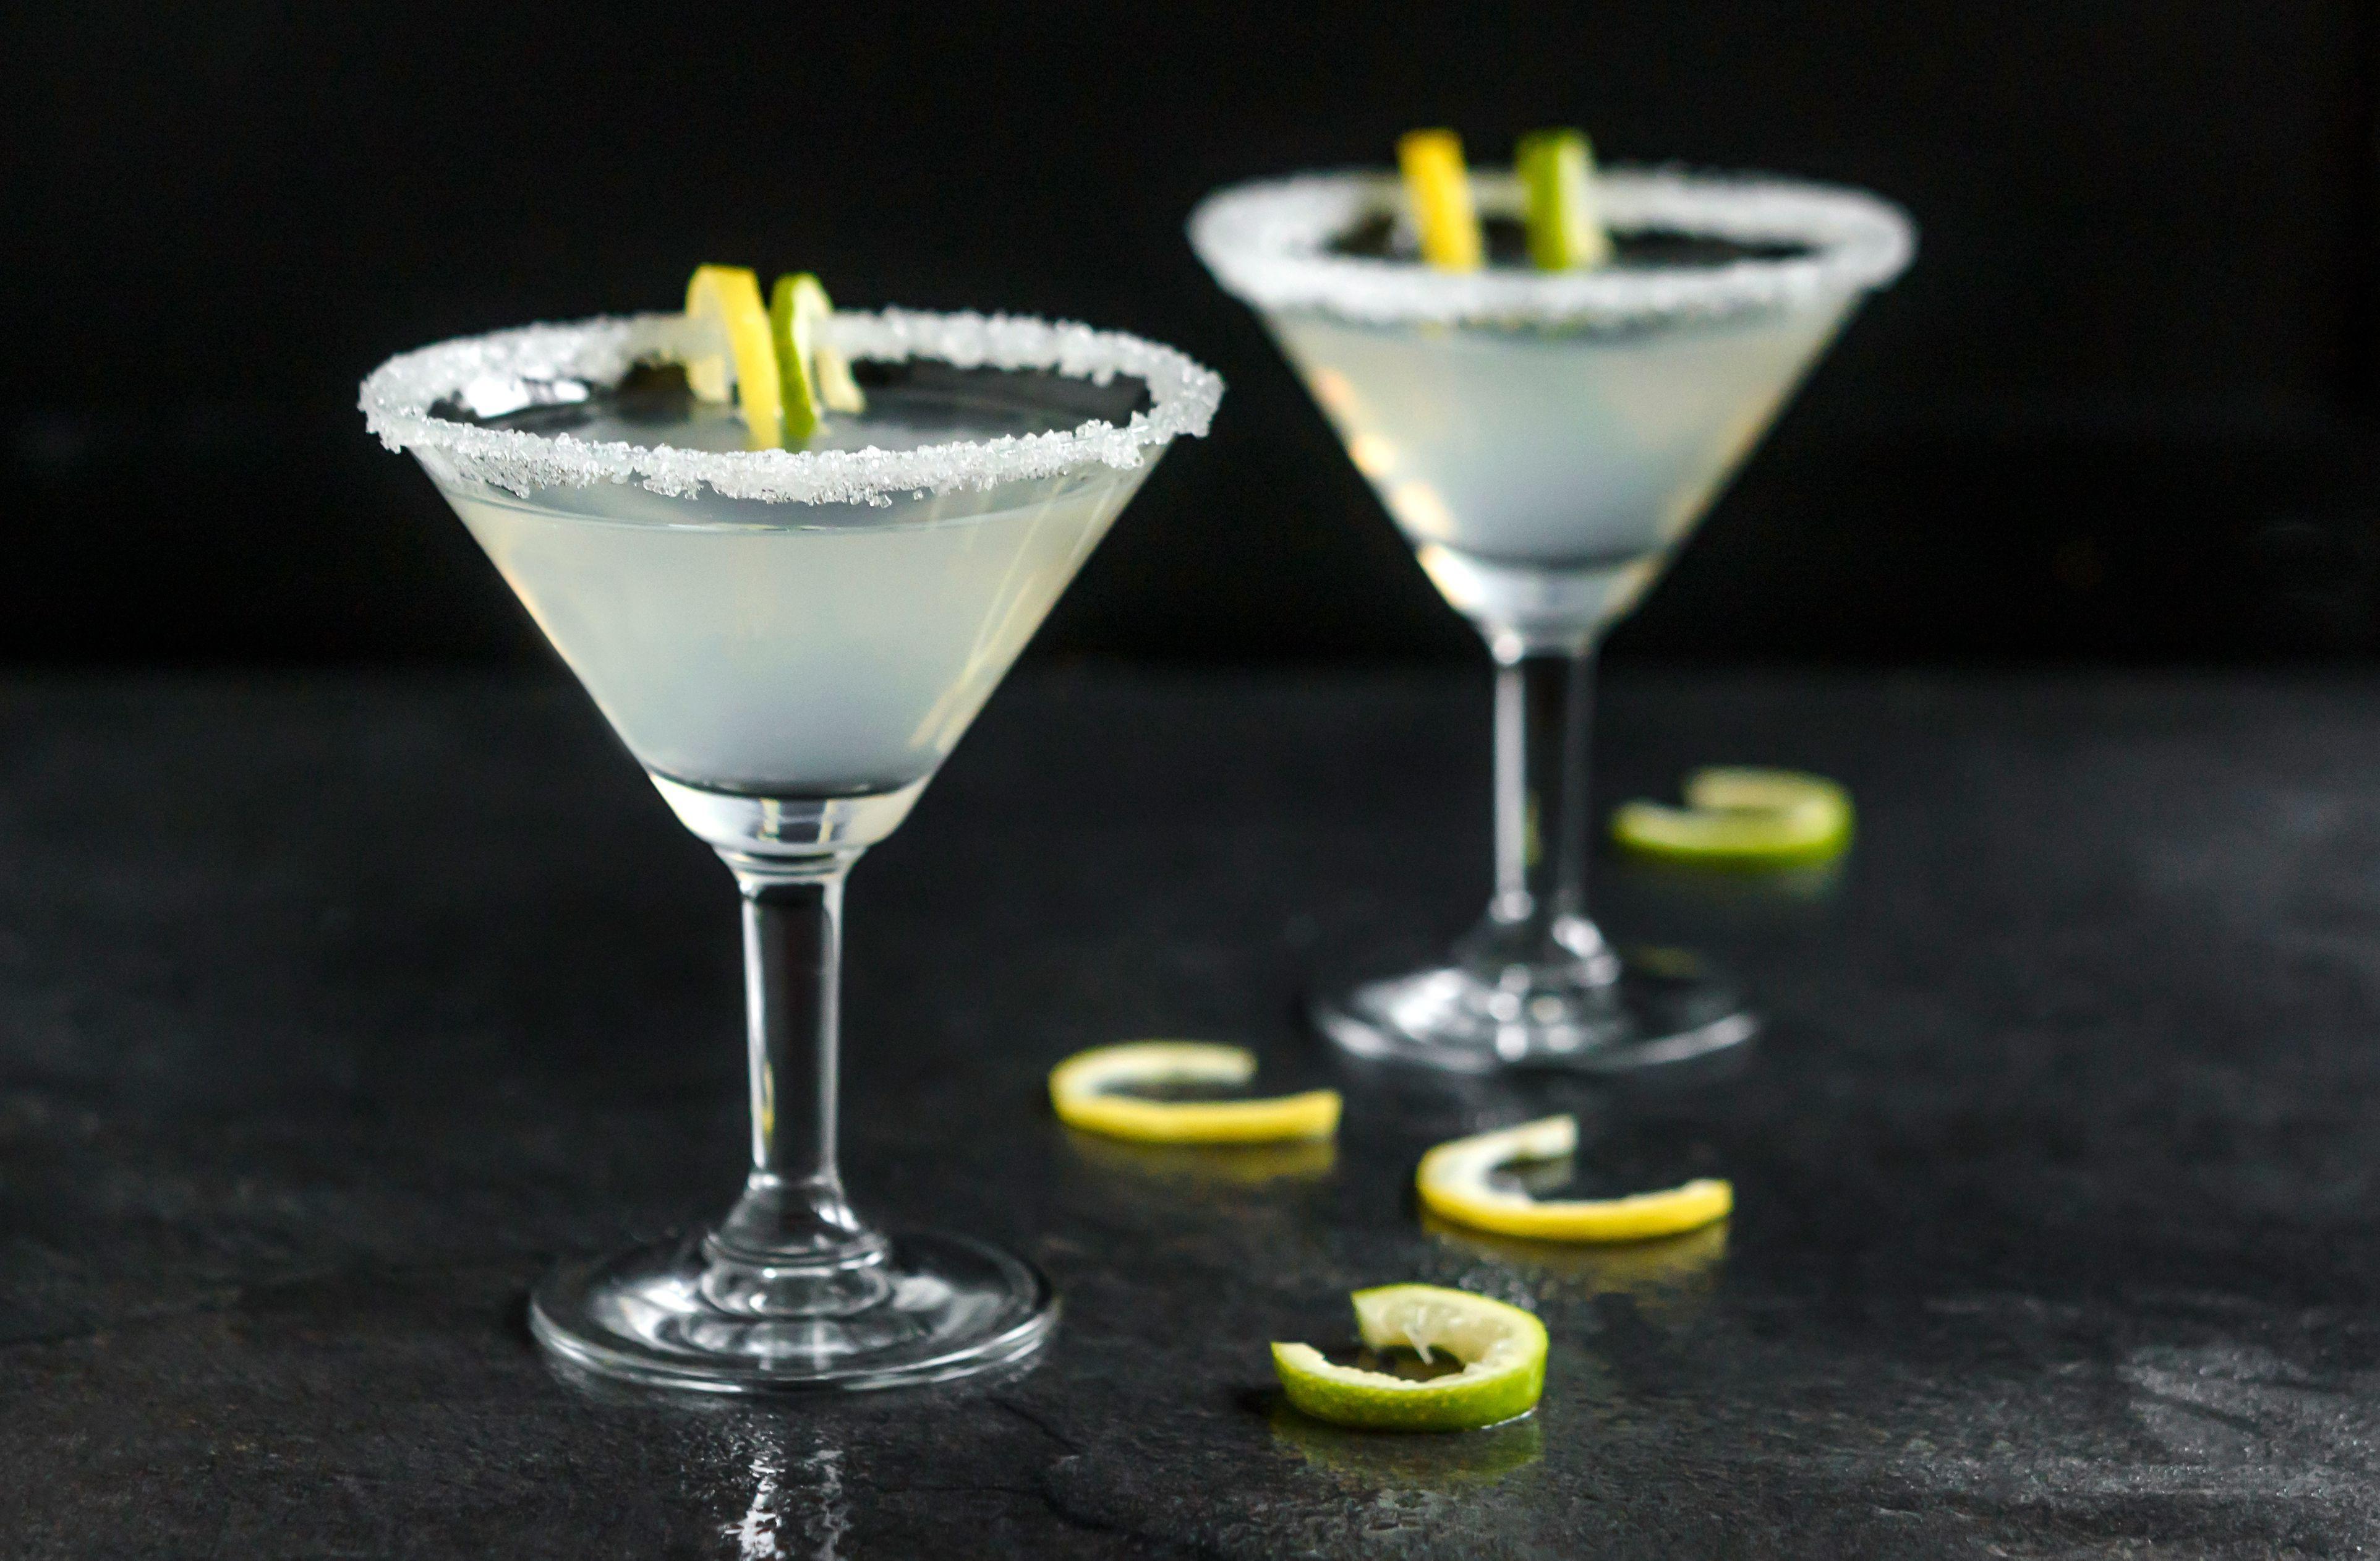 Show Off Your Best Vodka In The Clean Crisp Martini Recipe Popular Vodka Vodka Cocktails Vodka